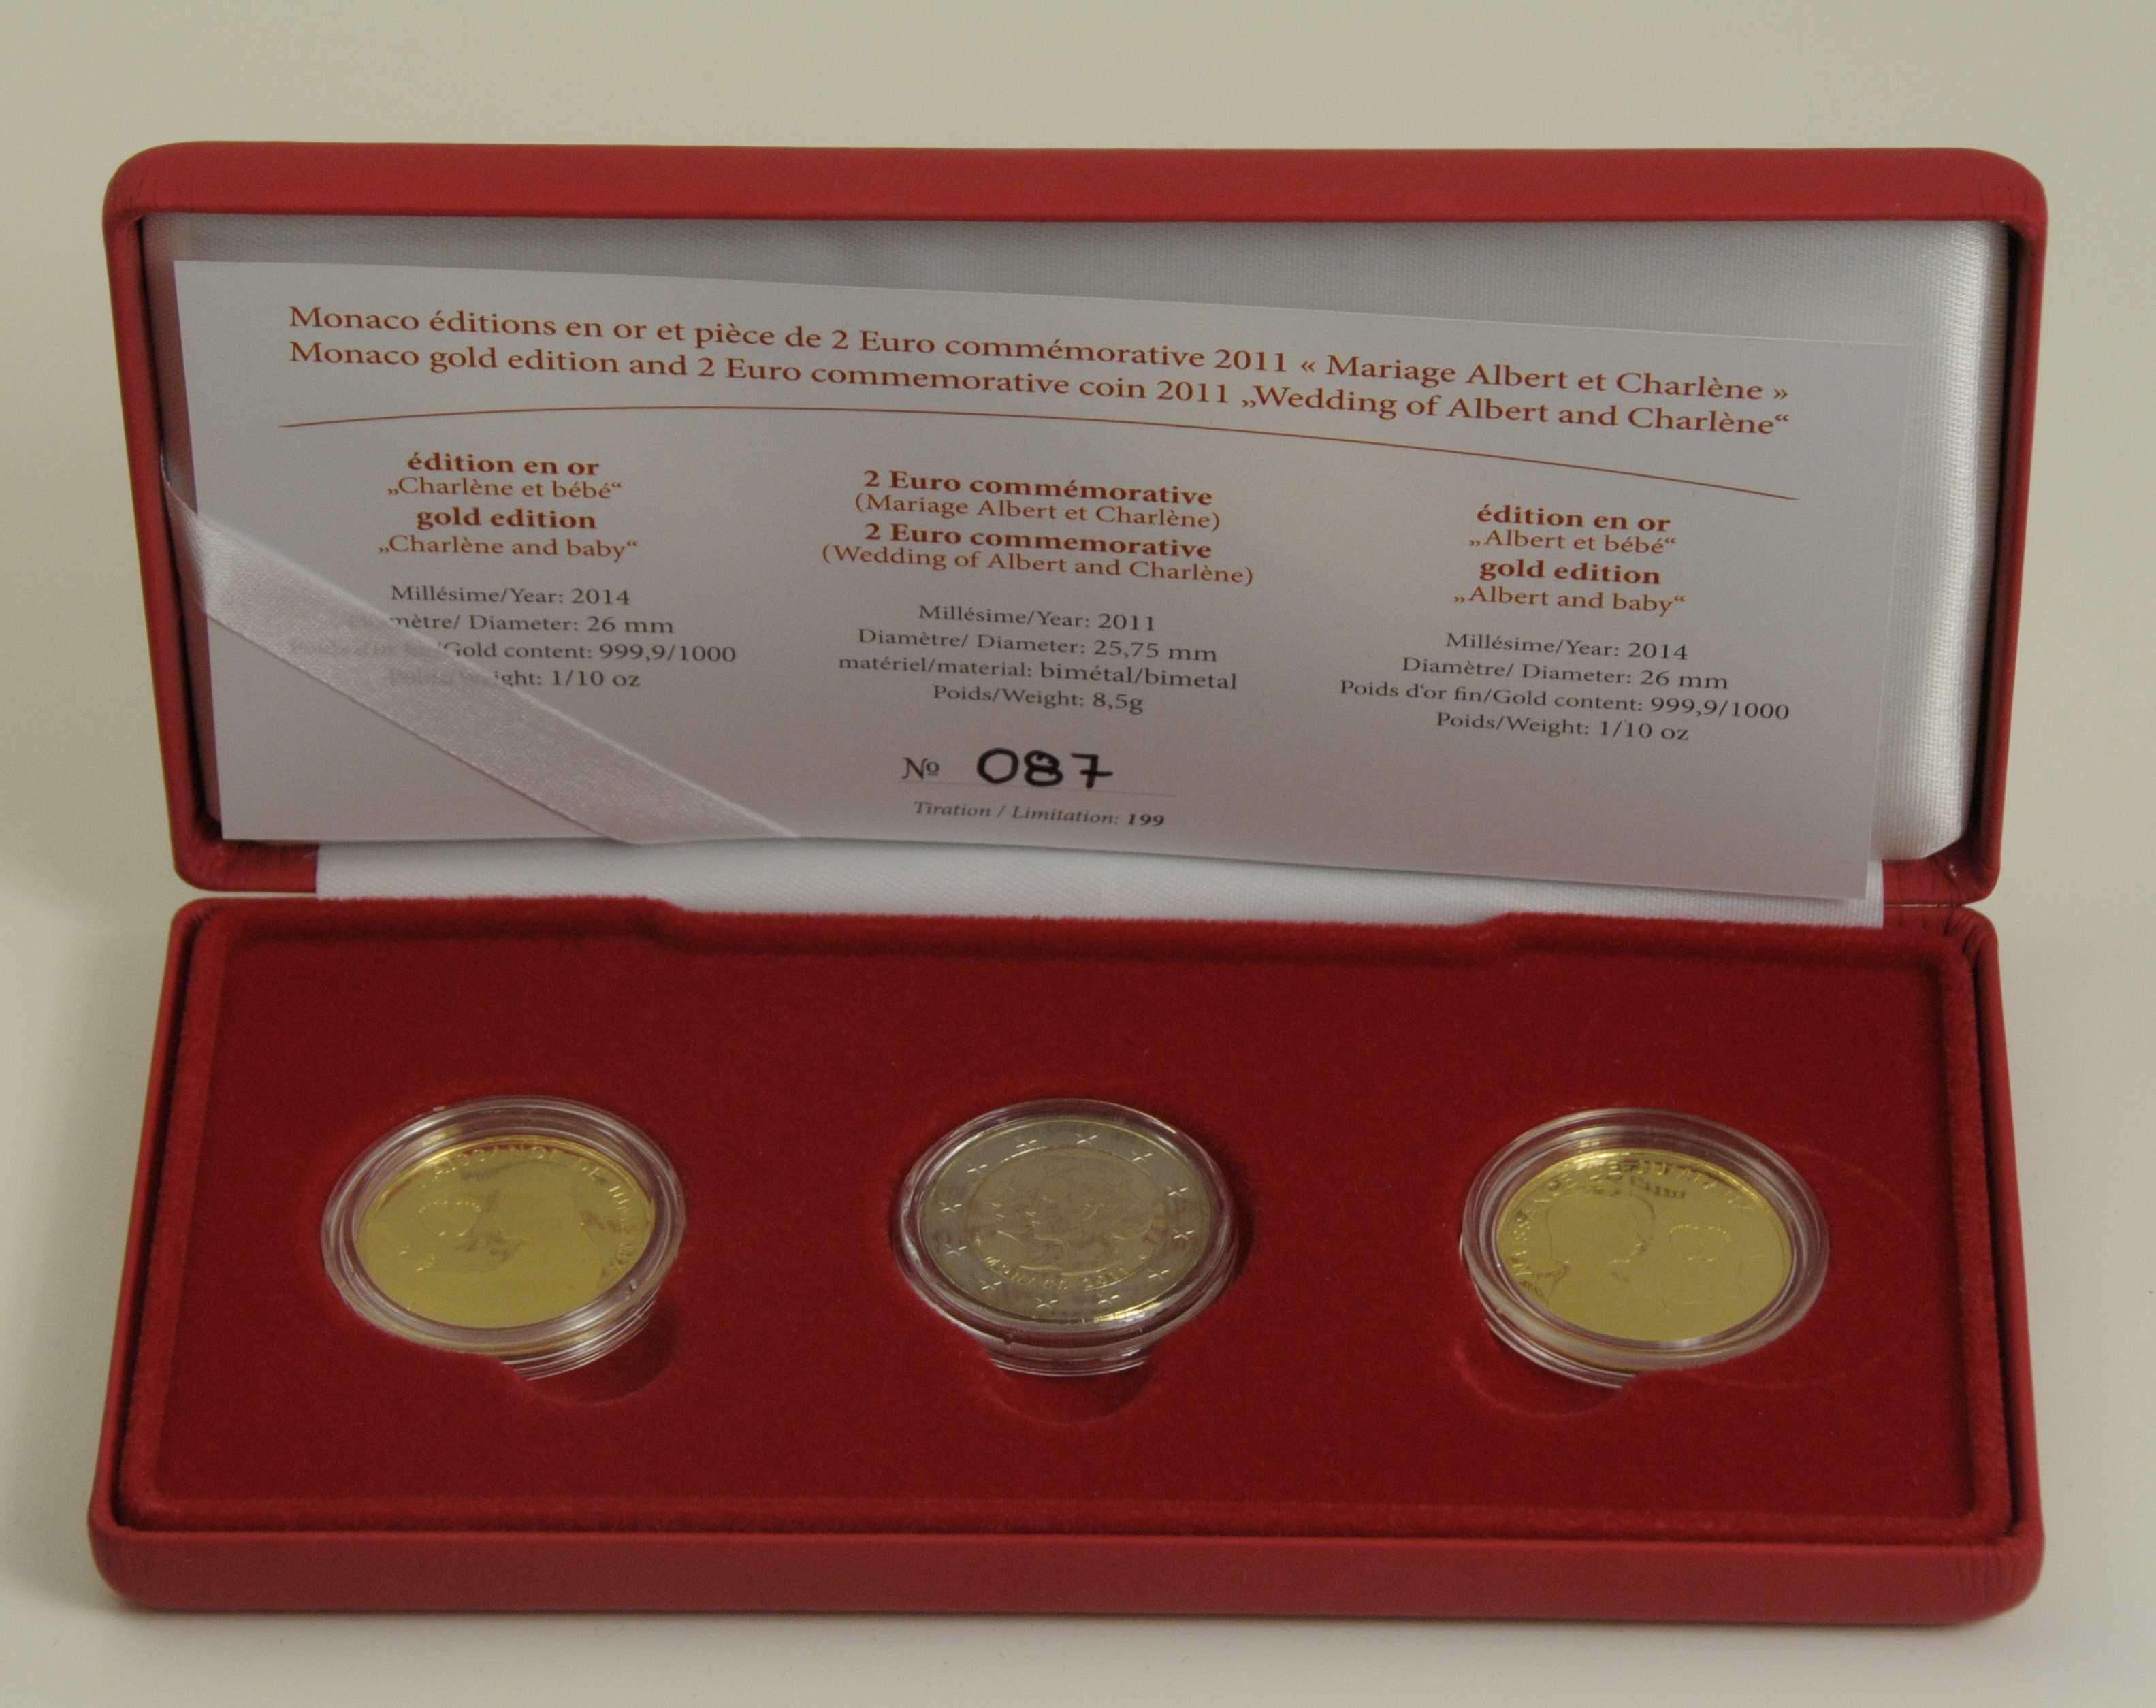 Lot 1836 - europa Euroländer - Monaco -  Auktionshaus Ulrich Felzmann GmbH & Co. KG Coins single lots